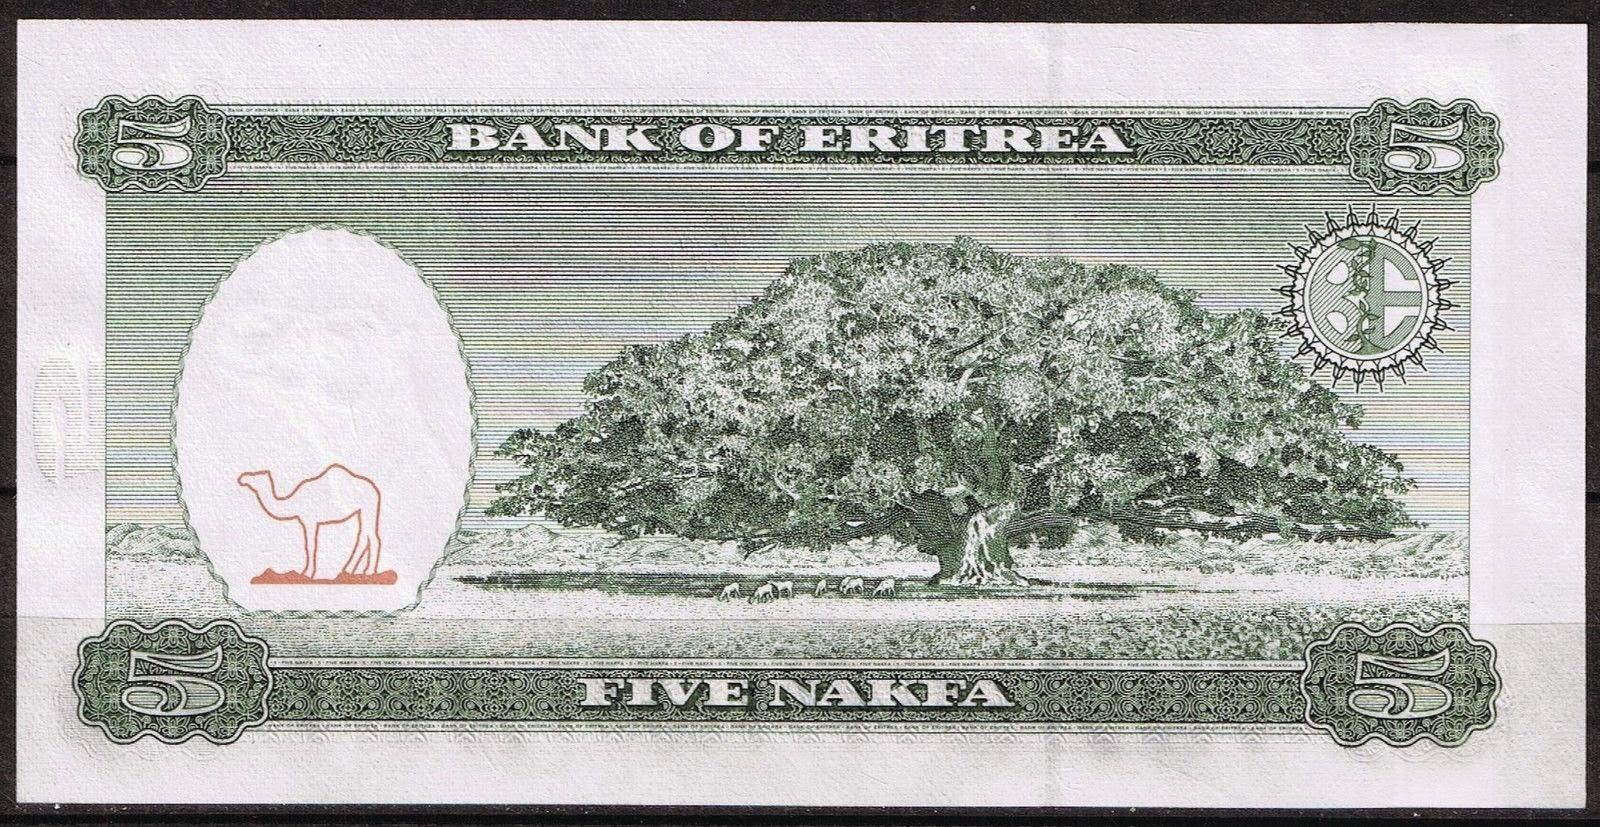 Currency of Eritrea 5 Nakfa Note